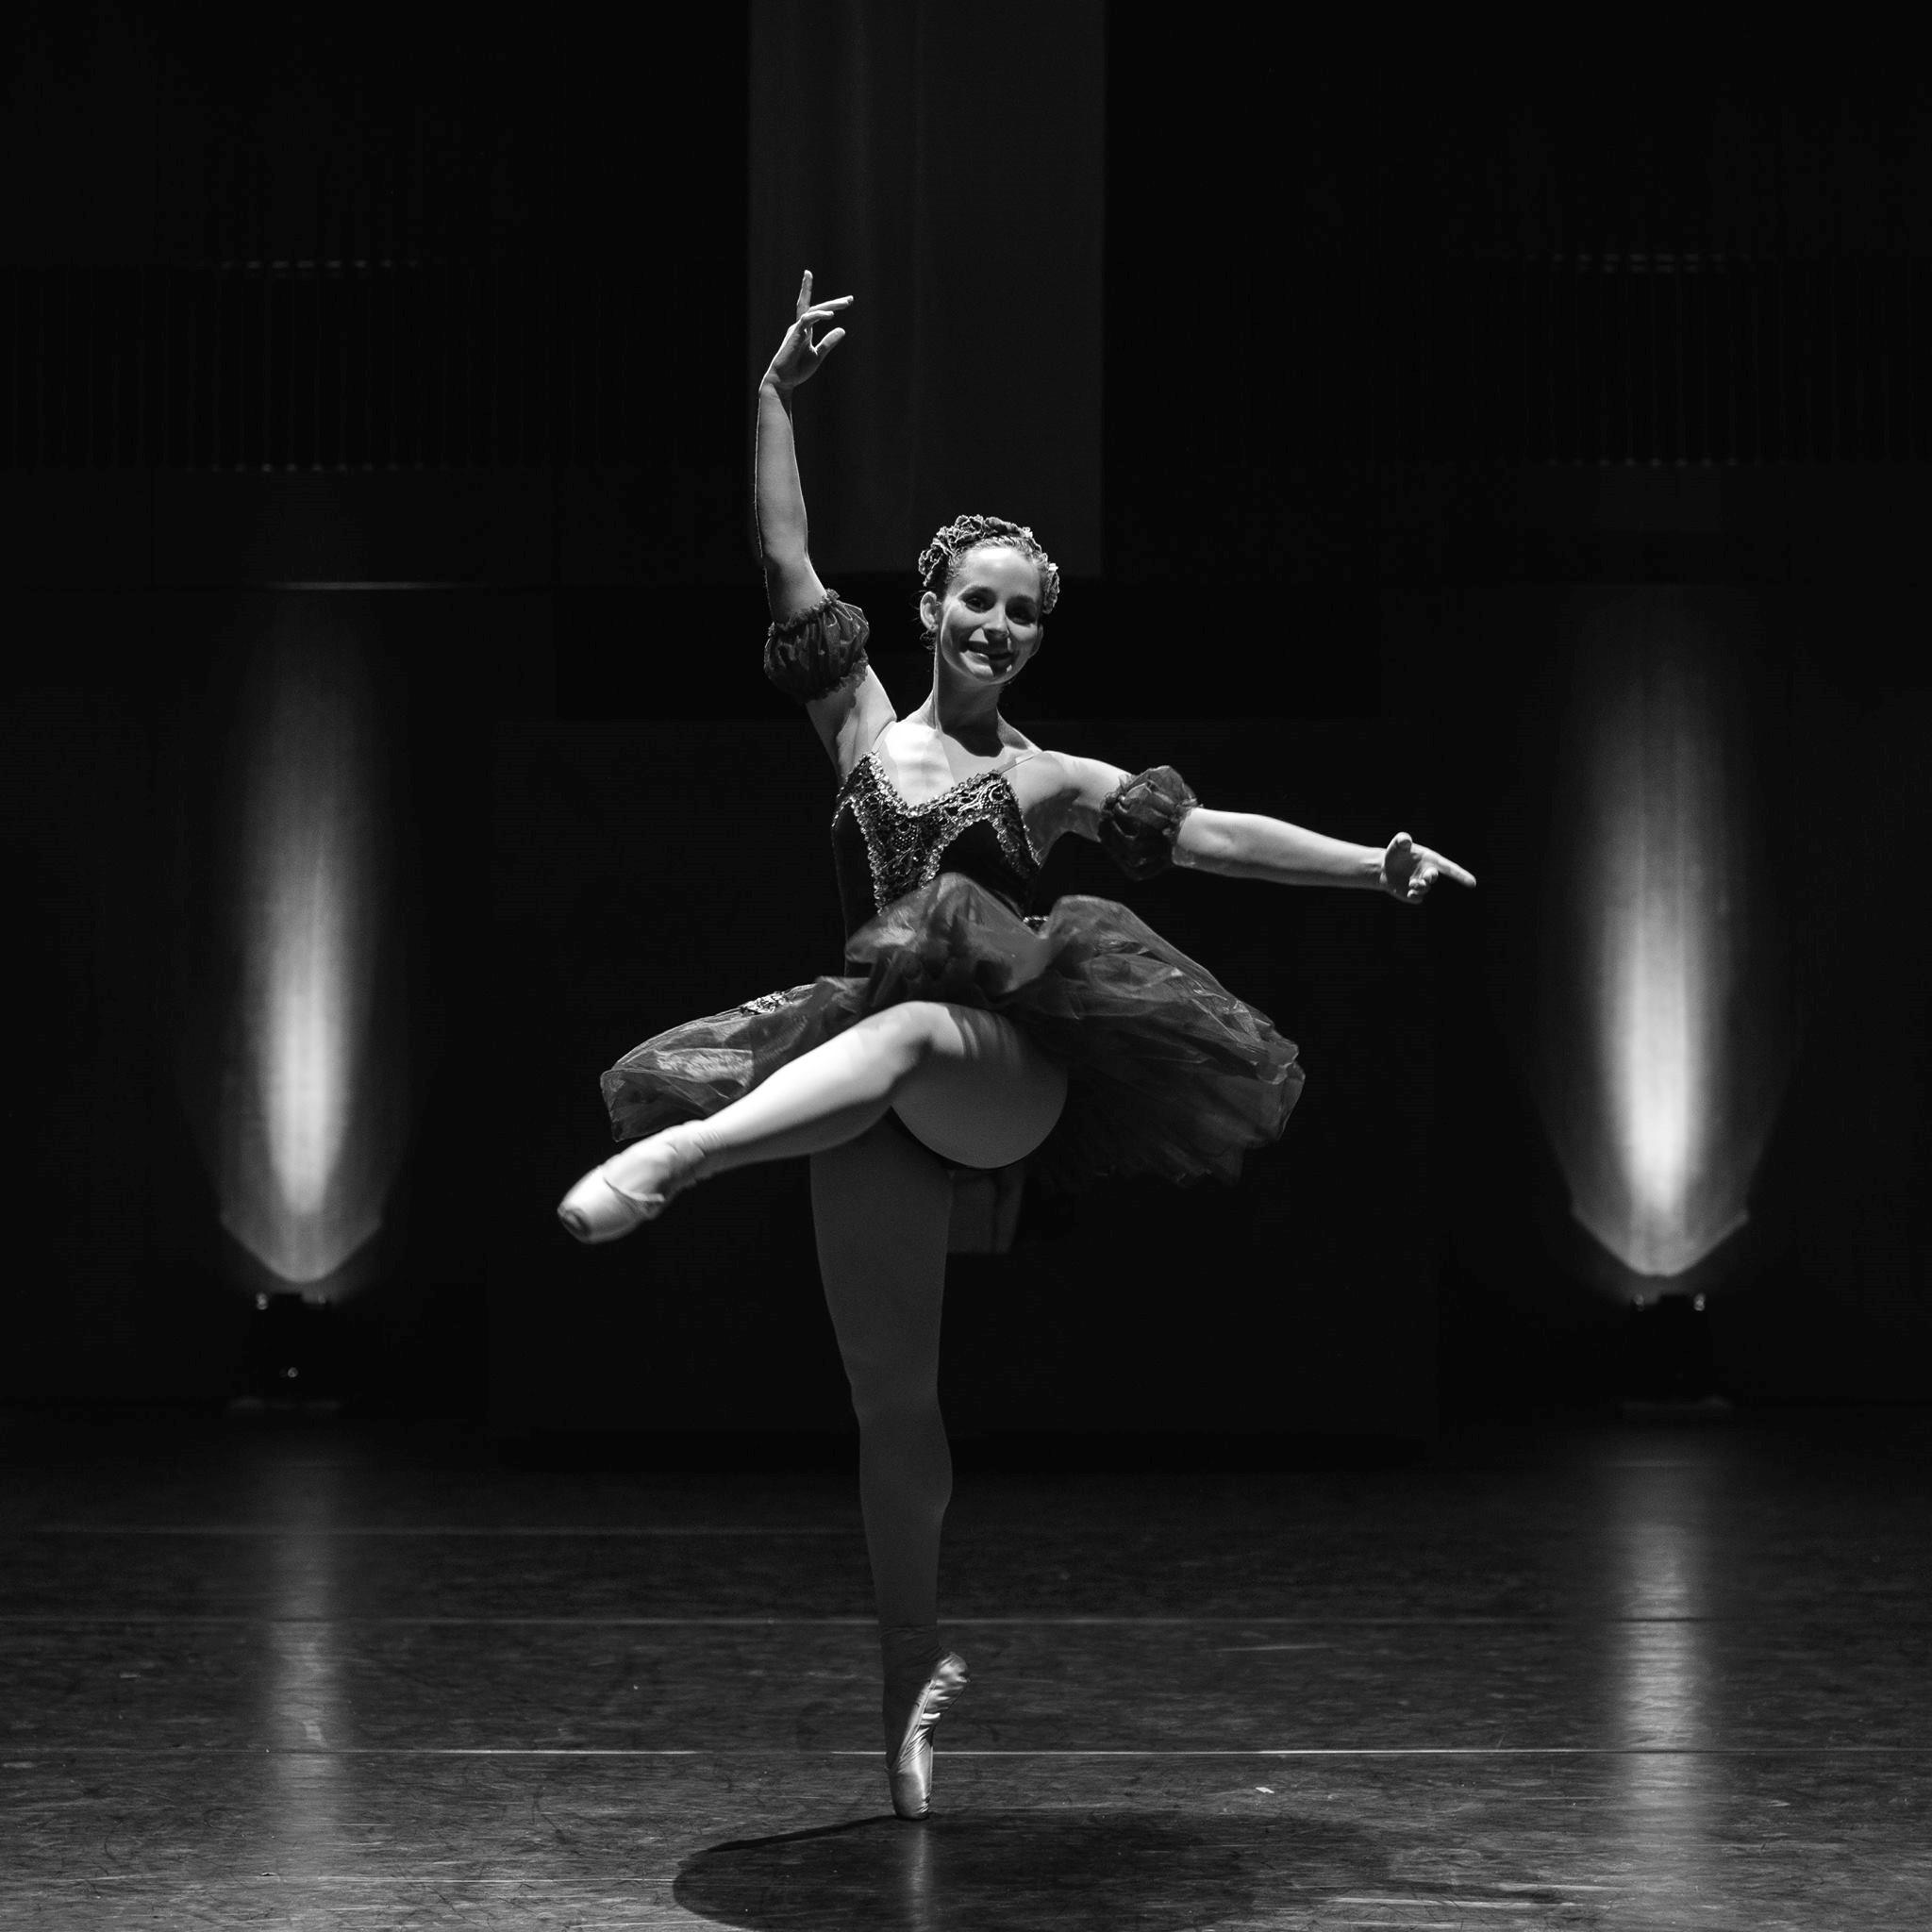 University Ballet of Chicago, Raymonda, 2014. PC: Varsha sundar